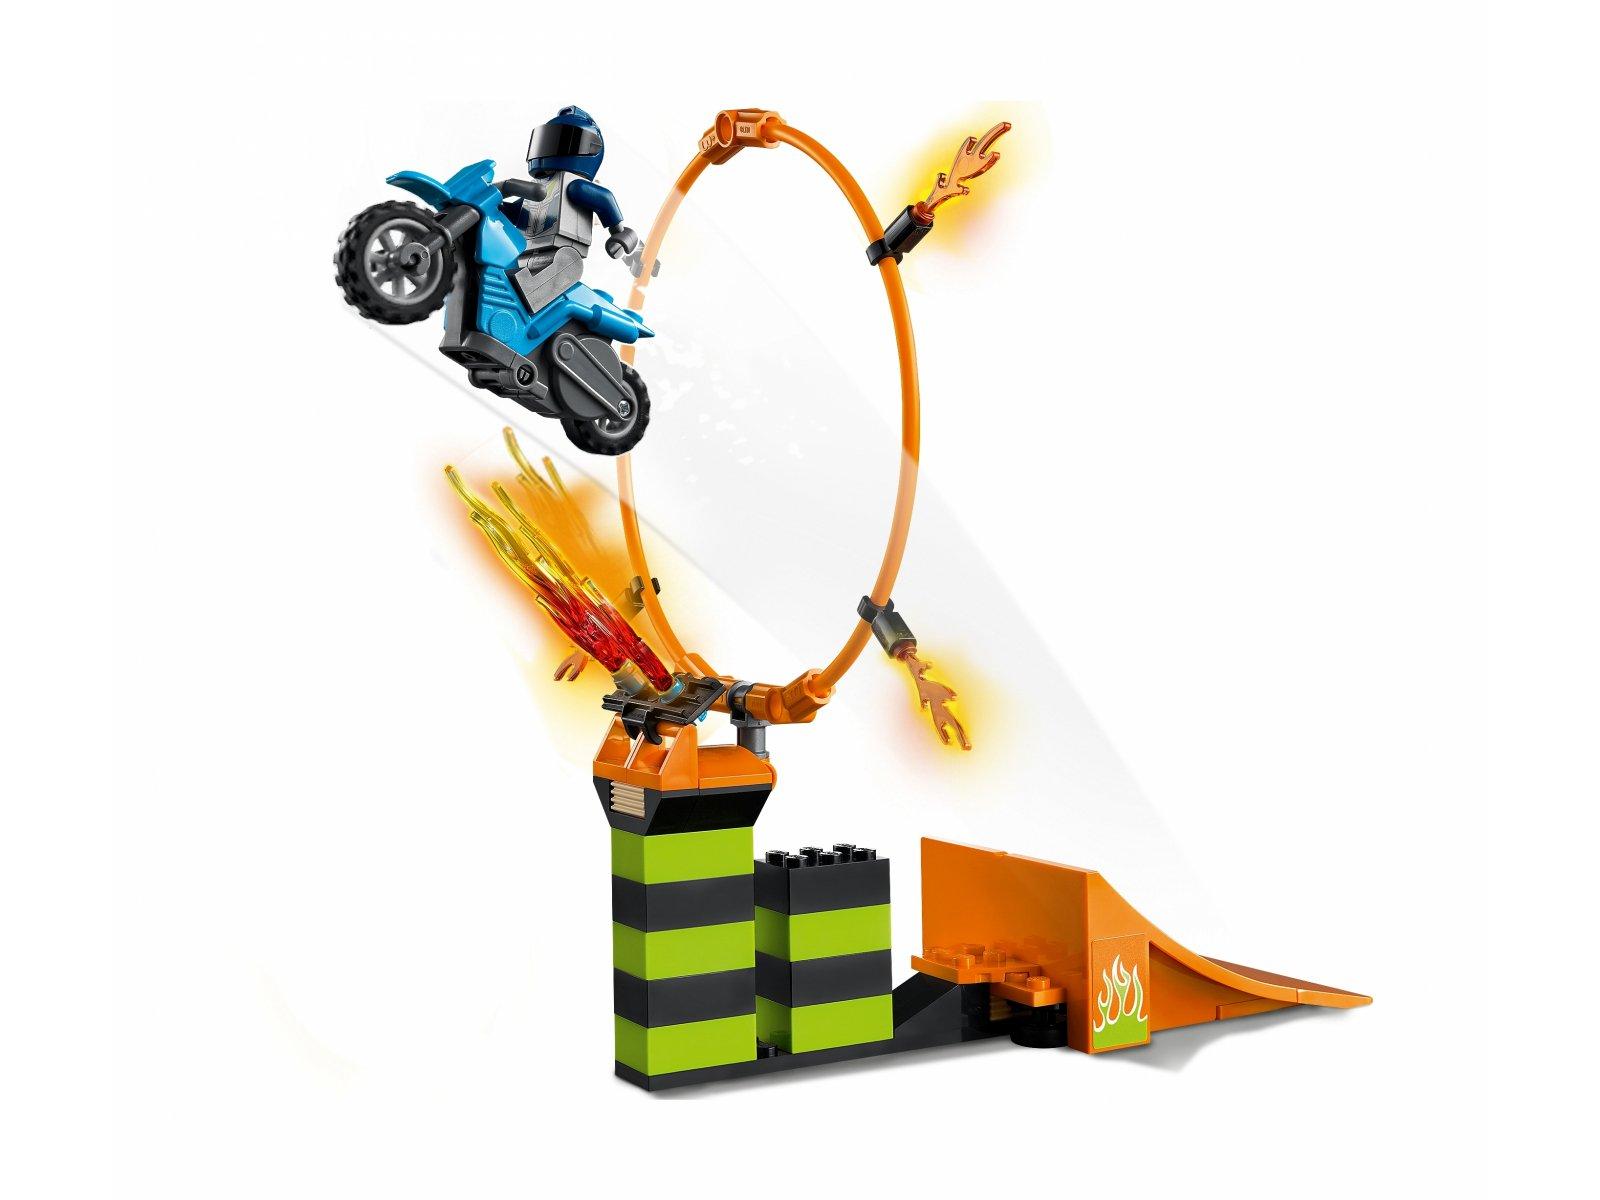 LEGO 60299 City Konkurs kaskaderski